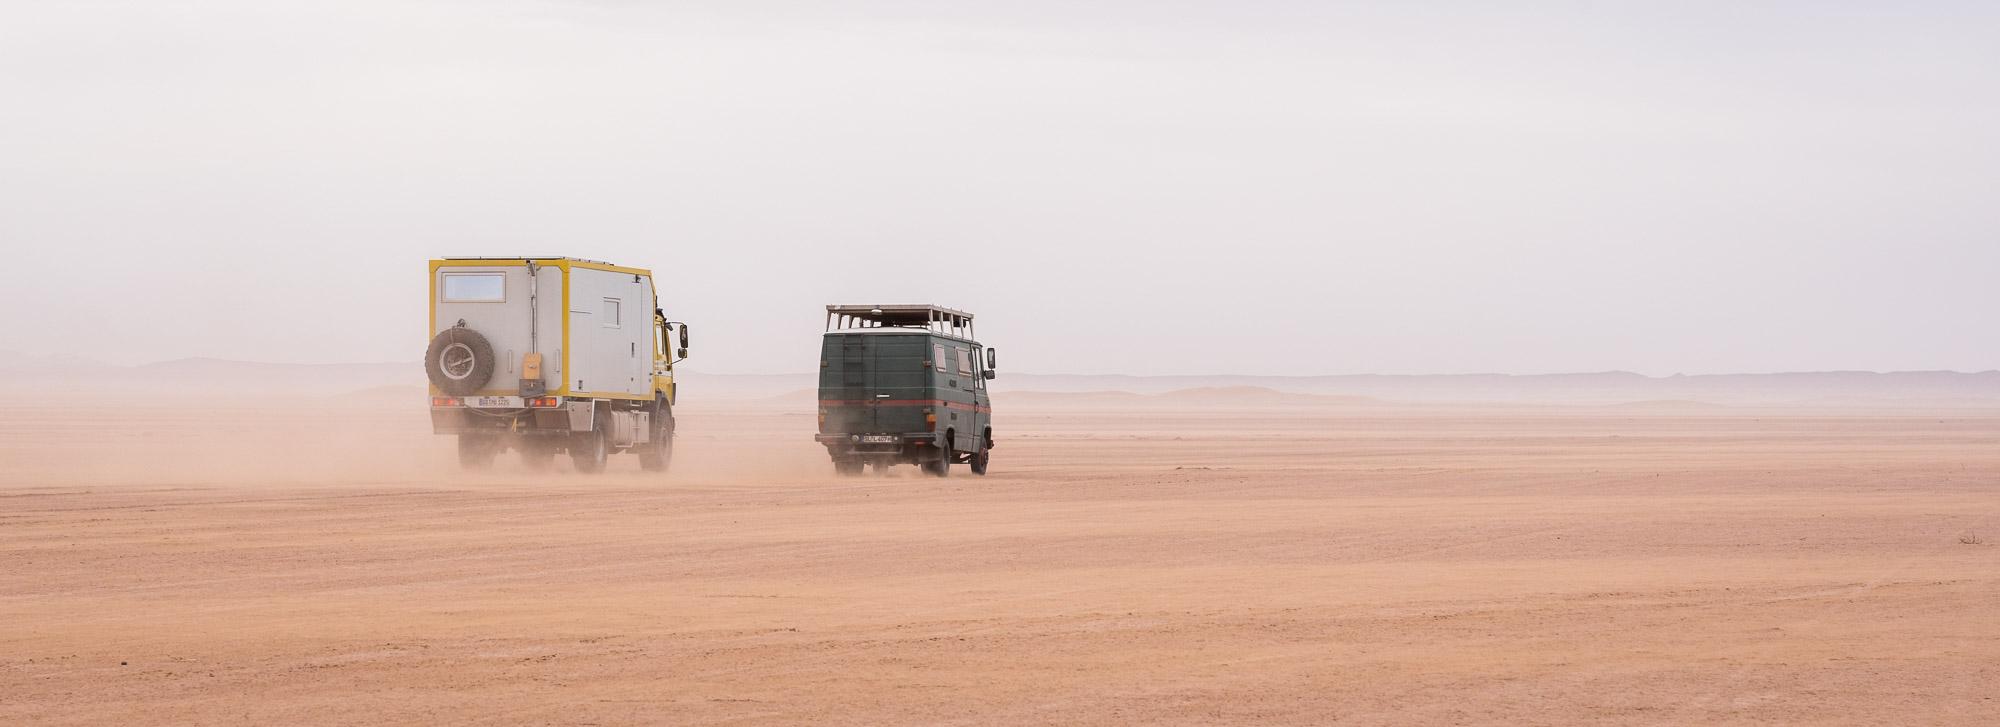 Marokko | Staffel 2, Folge 4: Erg Chegaga und Lac Iriki